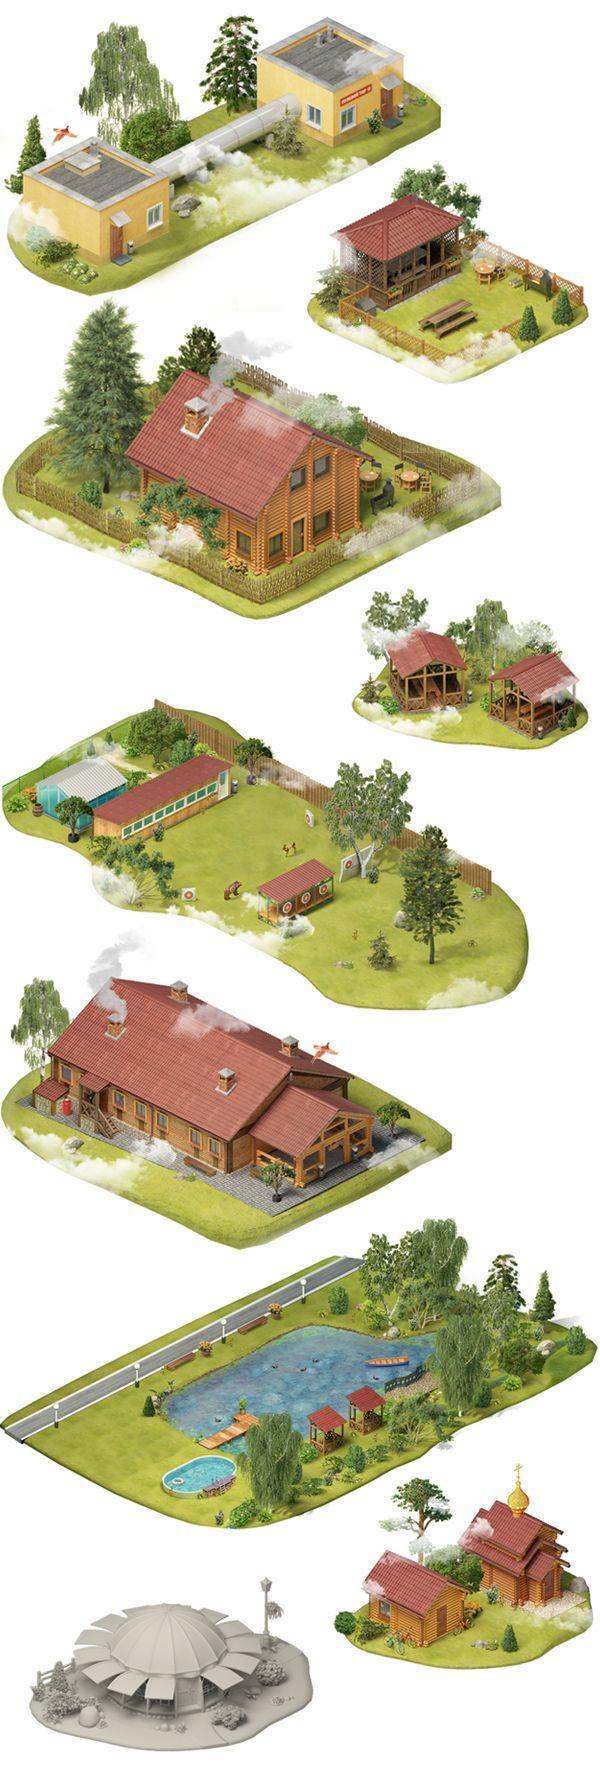 Sporting center map by ILYA Denisenko, via Behance